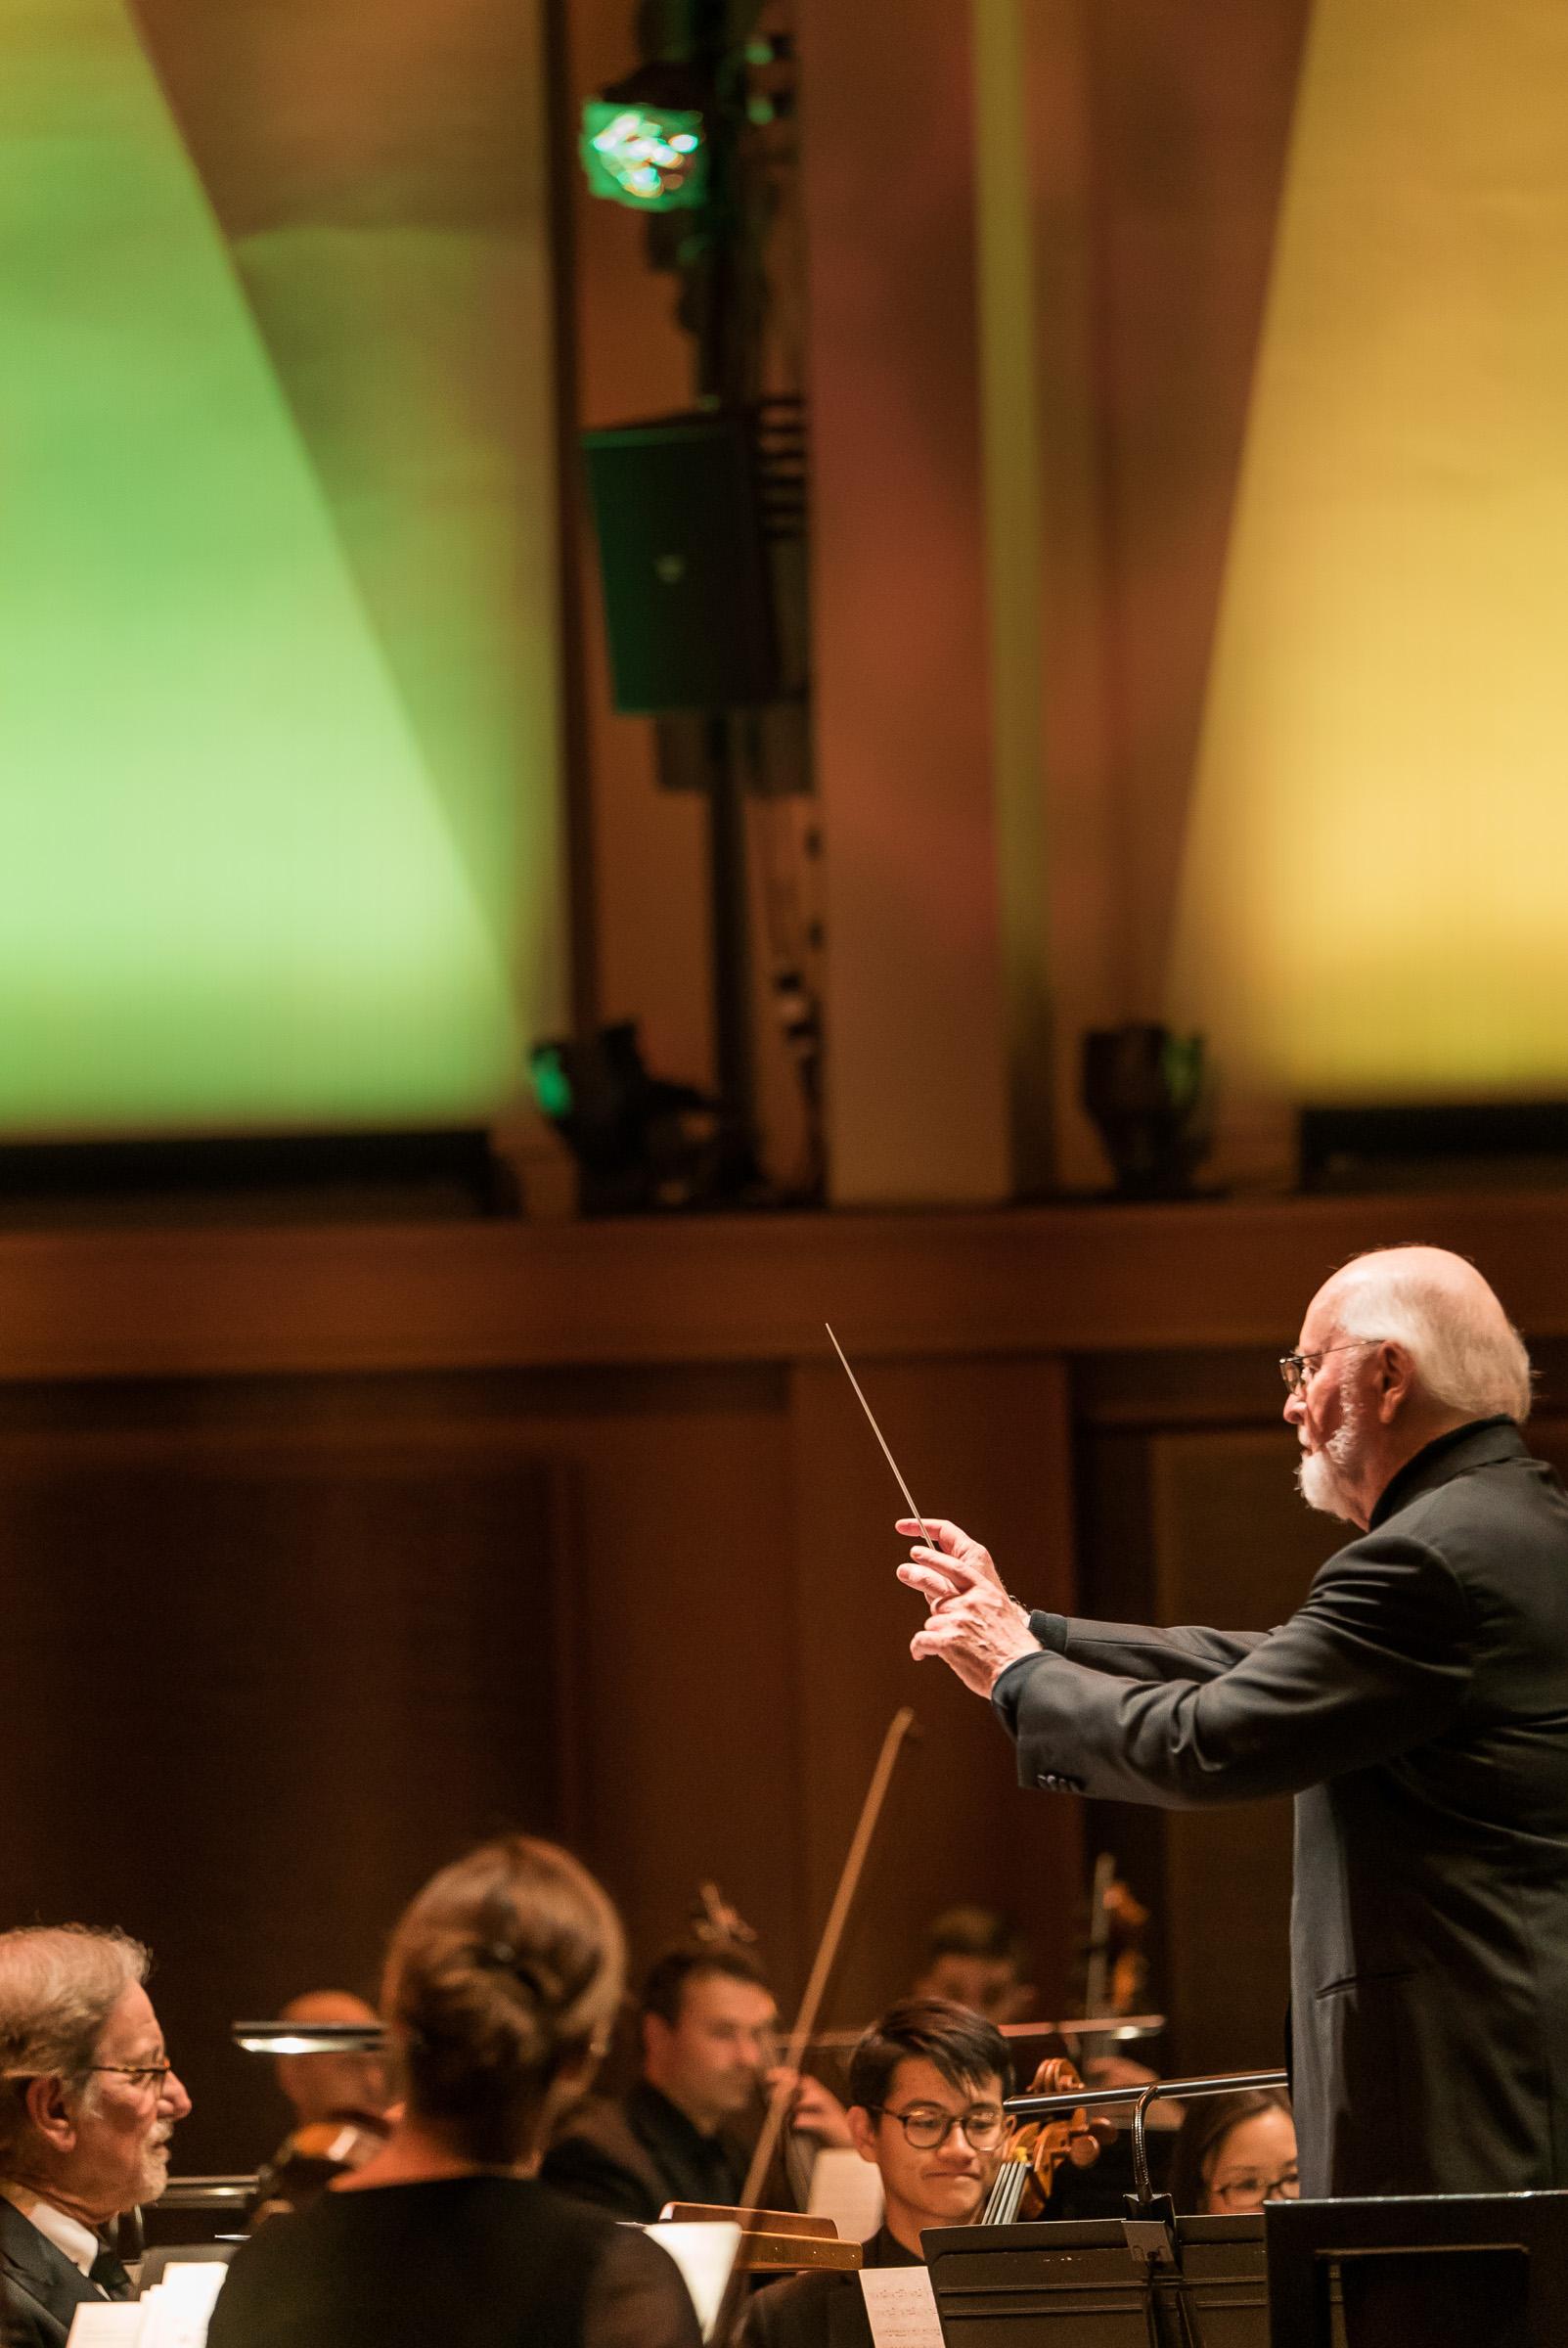 brandon_patoc_john_williams_Steven_Spielberg, Seattle_Symphony_Orchestra_Conert_0051.JPG